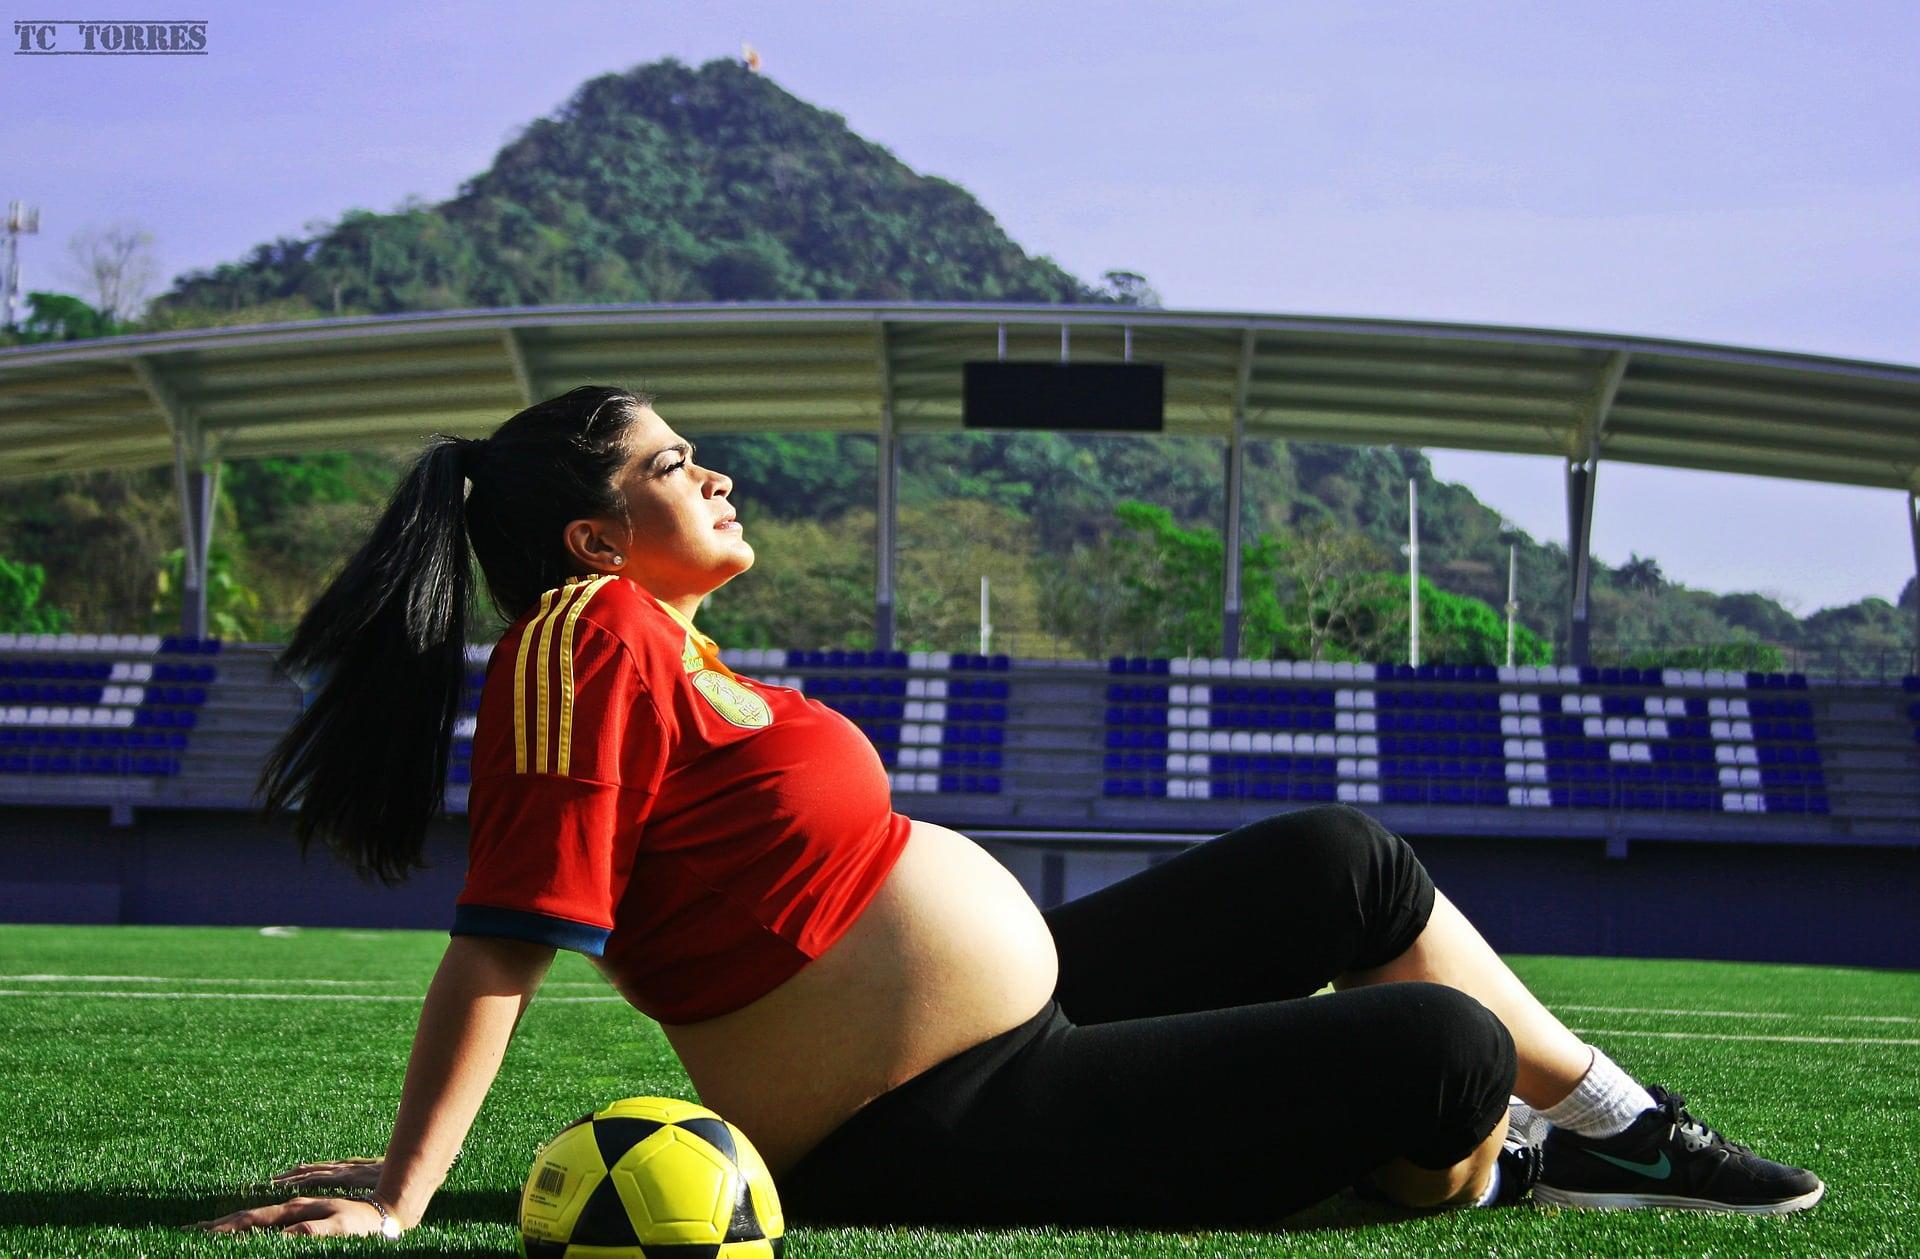 Femme enceinte qui joue au football